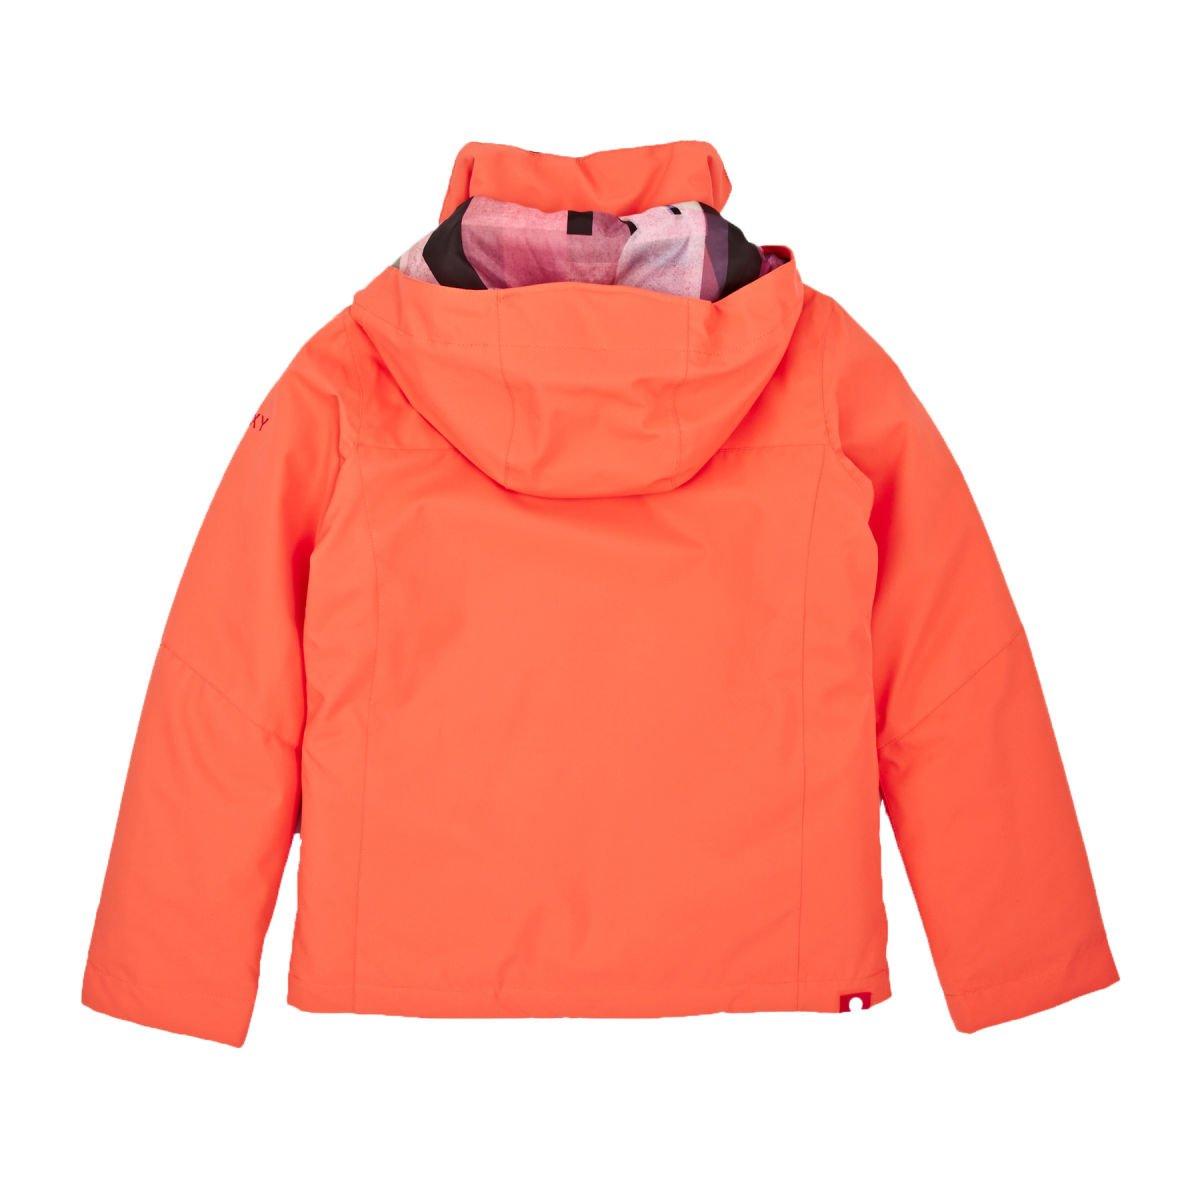 1f6d8abb4 Roxy Jetty Girl s Snow Jacket  Roxy  Amazon.co.uk  Sports   Outdoors